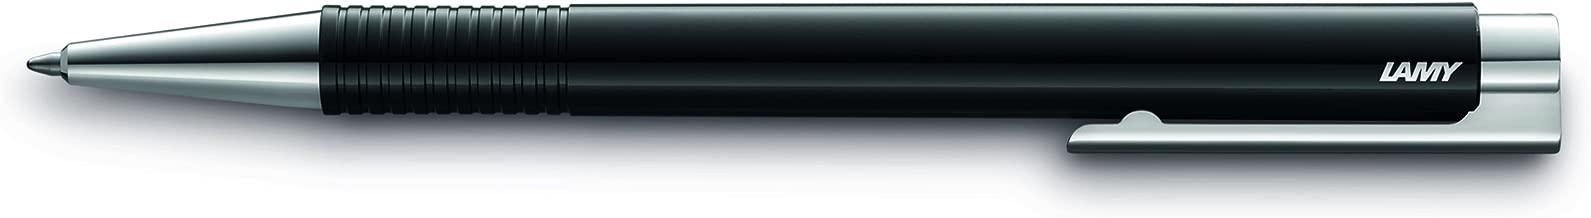 LAMY Black Logo M+ Ballpoint Pen with Black Ink (L204MBK)